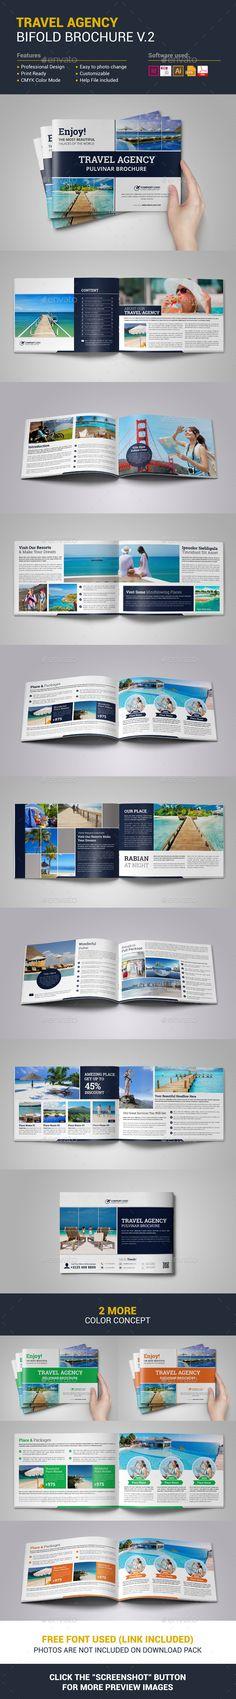 Travel Agency Bifold Brochure Template Vector EPS, InDesign INDD, AI Illustrator